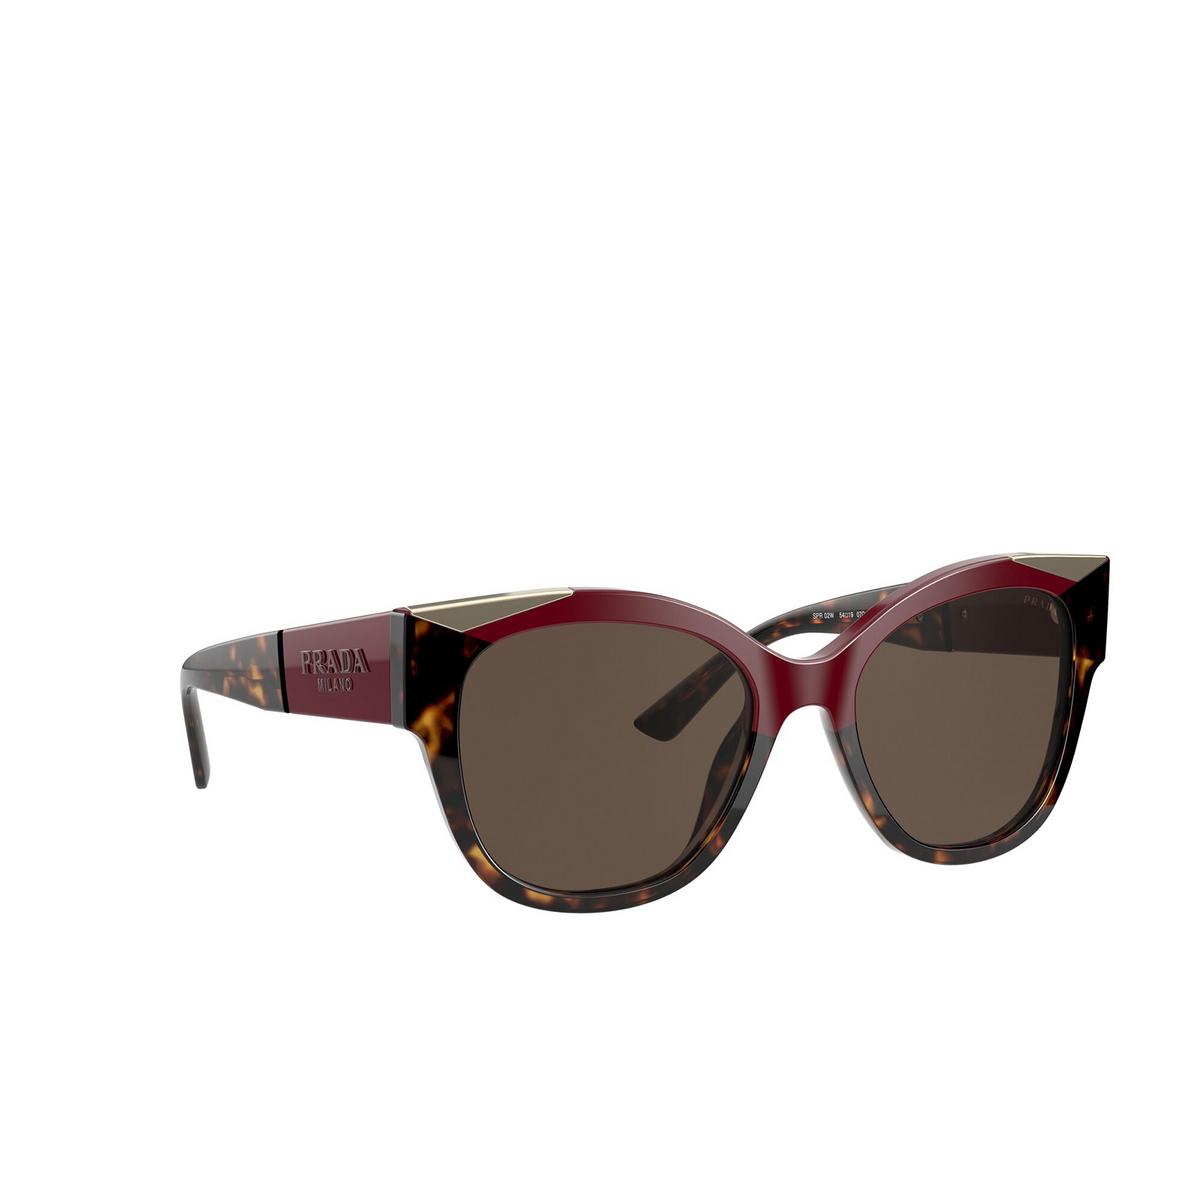 Prada® Butterfly Sunglasses: PR 02WS color Cherry / Dark Havana 07C0D1 - three-quarters view.